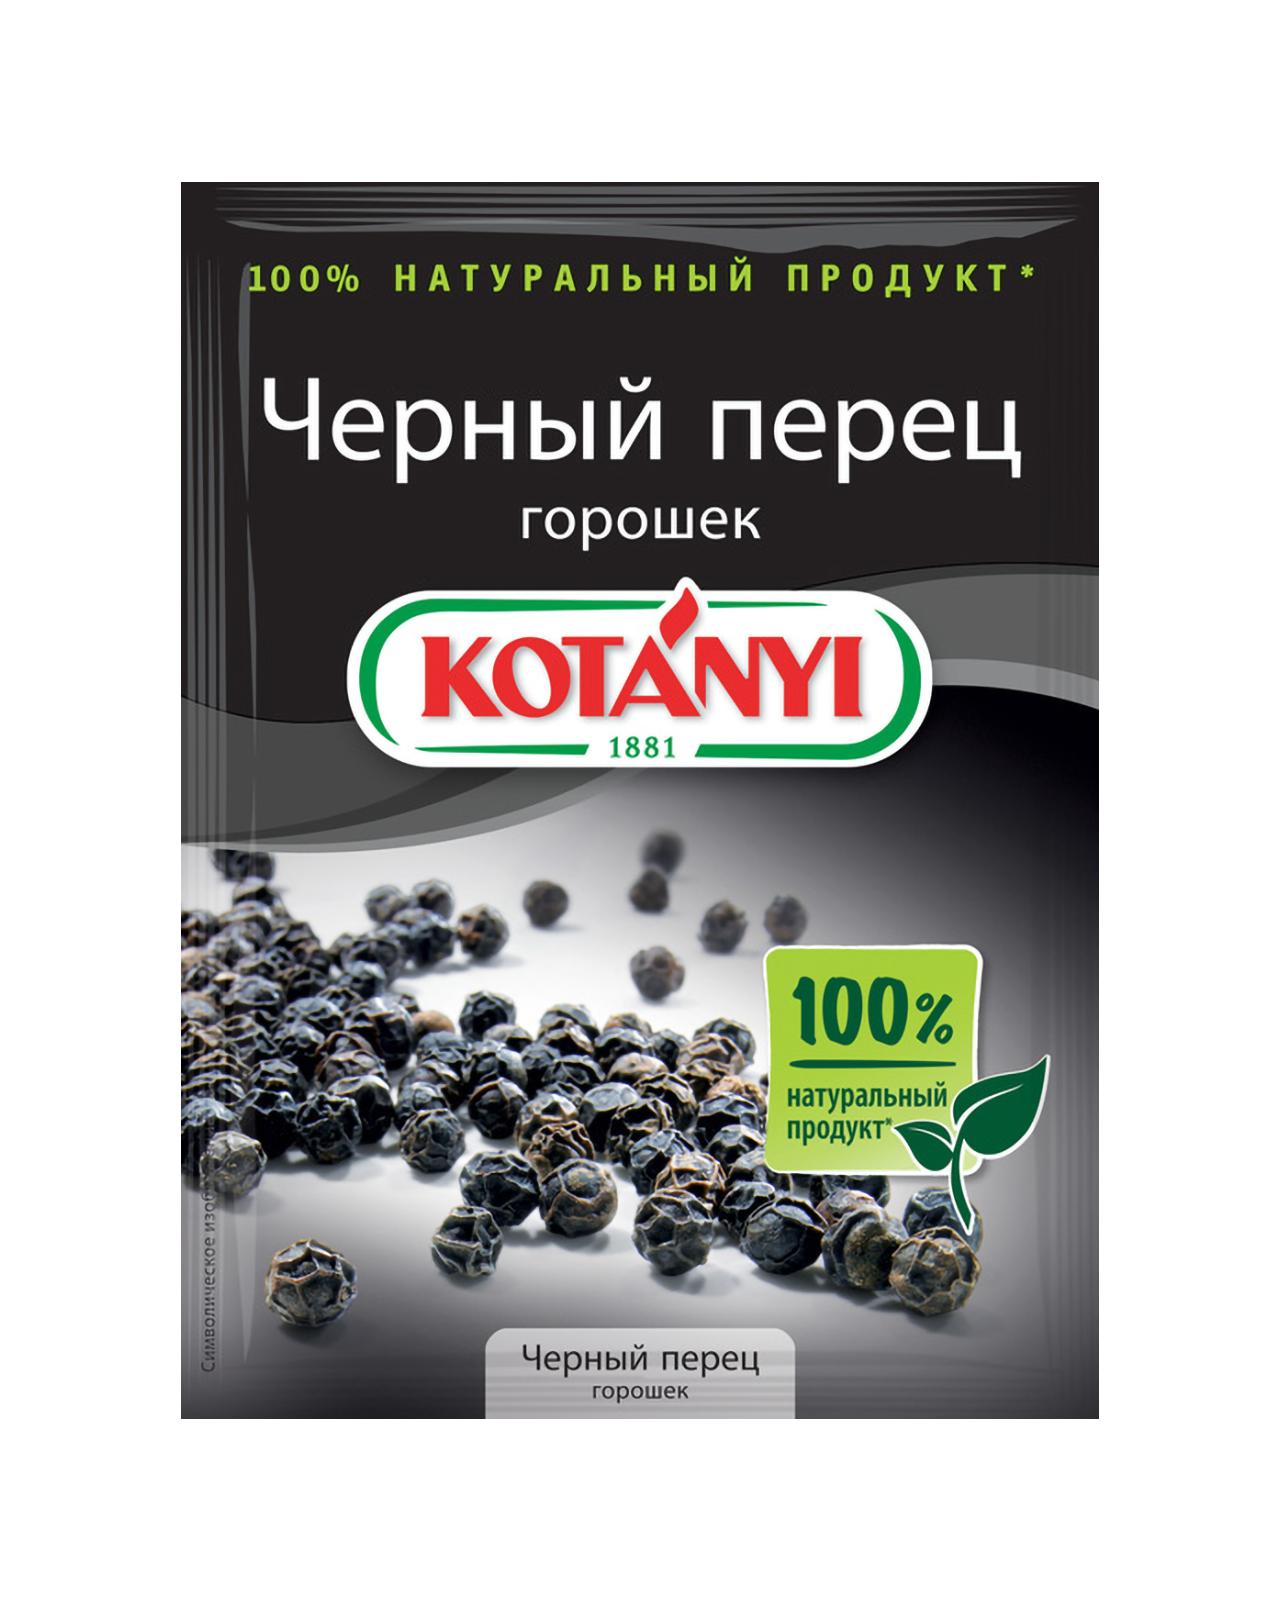 154511 Kotanyi Chernyi Perets Gorosher B2c Pouch